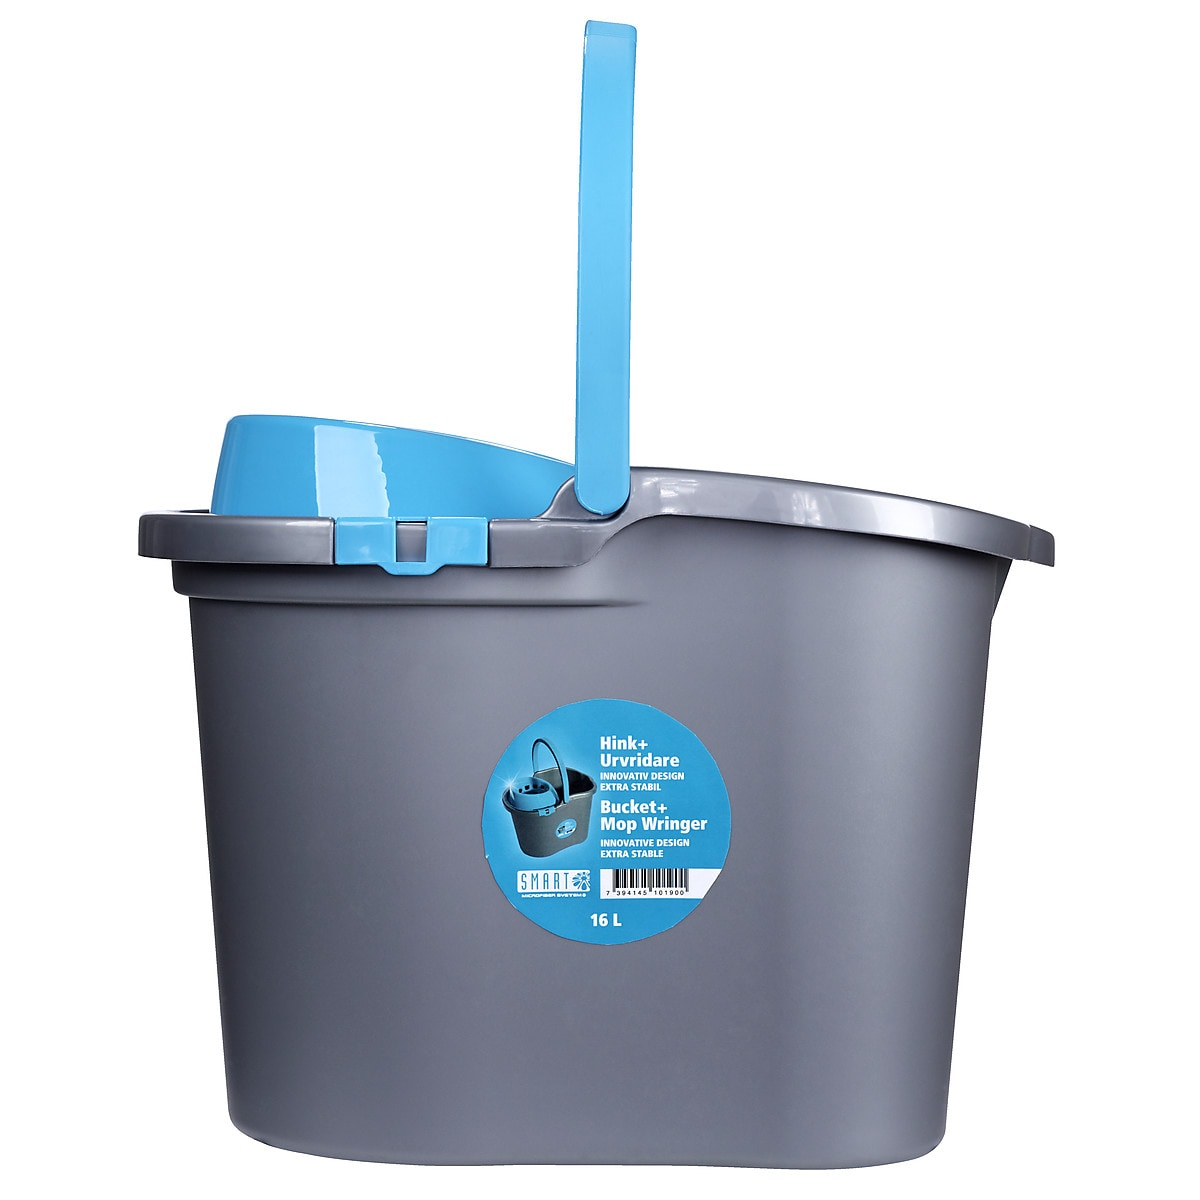 Hink 16 liter, Smart Microfiber